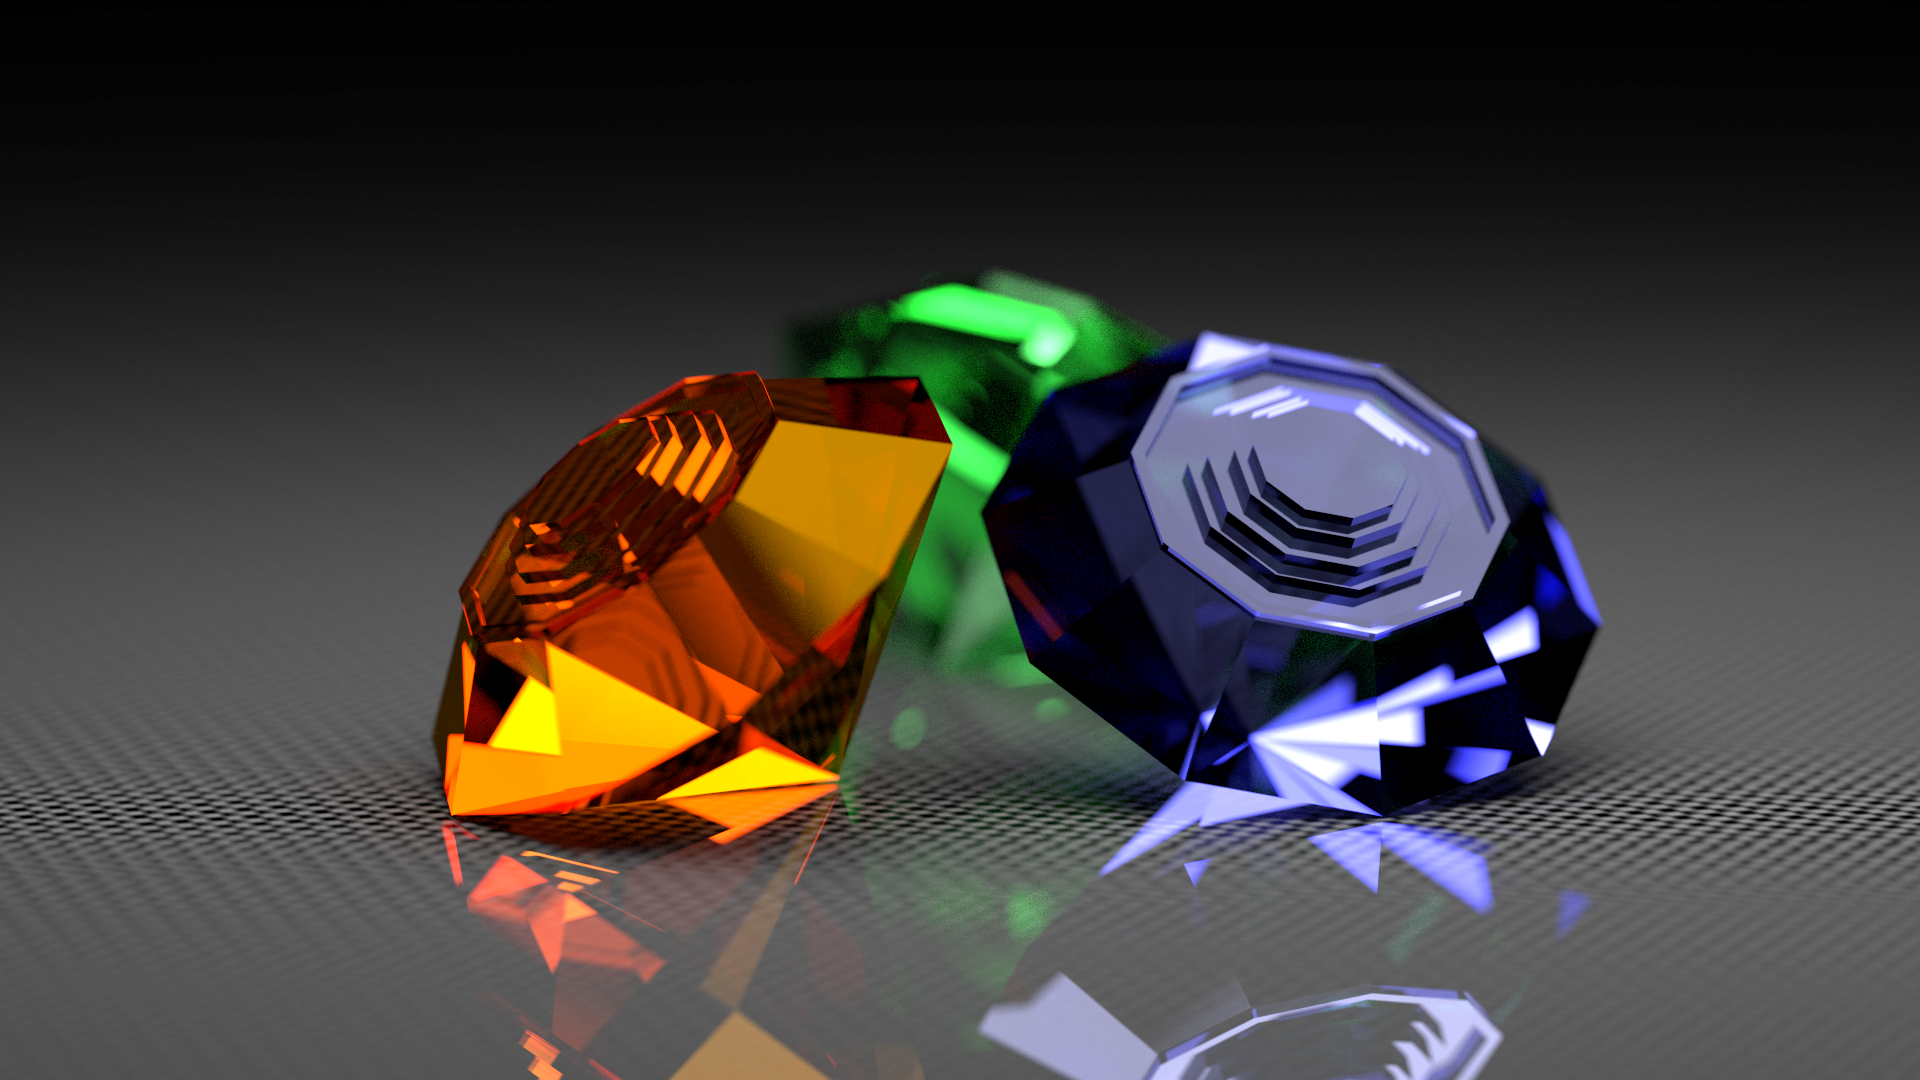 Minimalistic Diamonds (Full HD) By Dario999 On DeviantArt